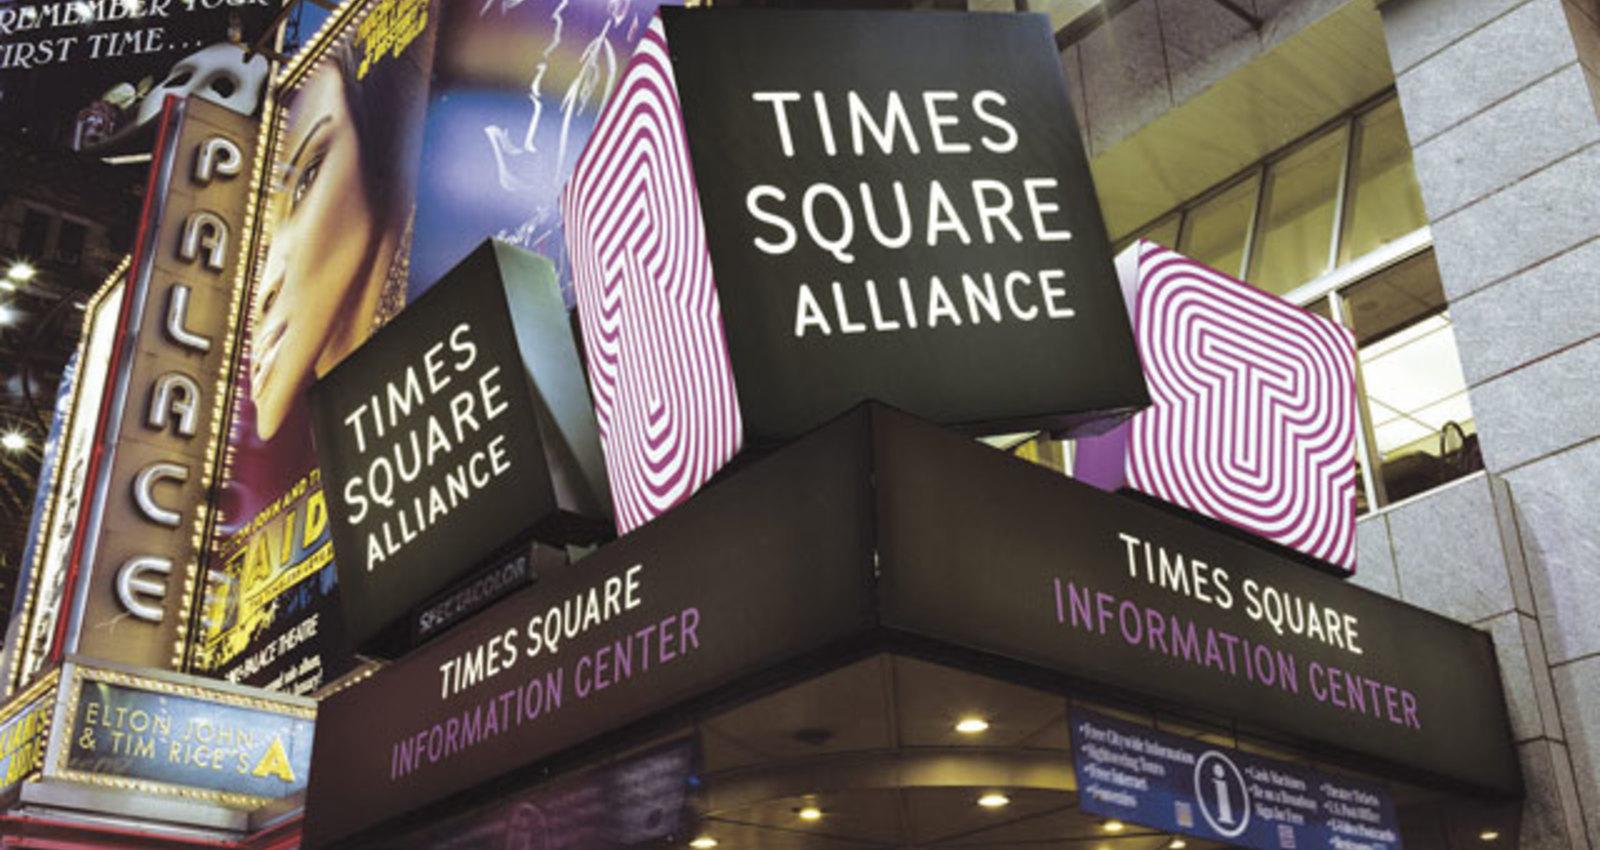 Times Square Alliance Identity